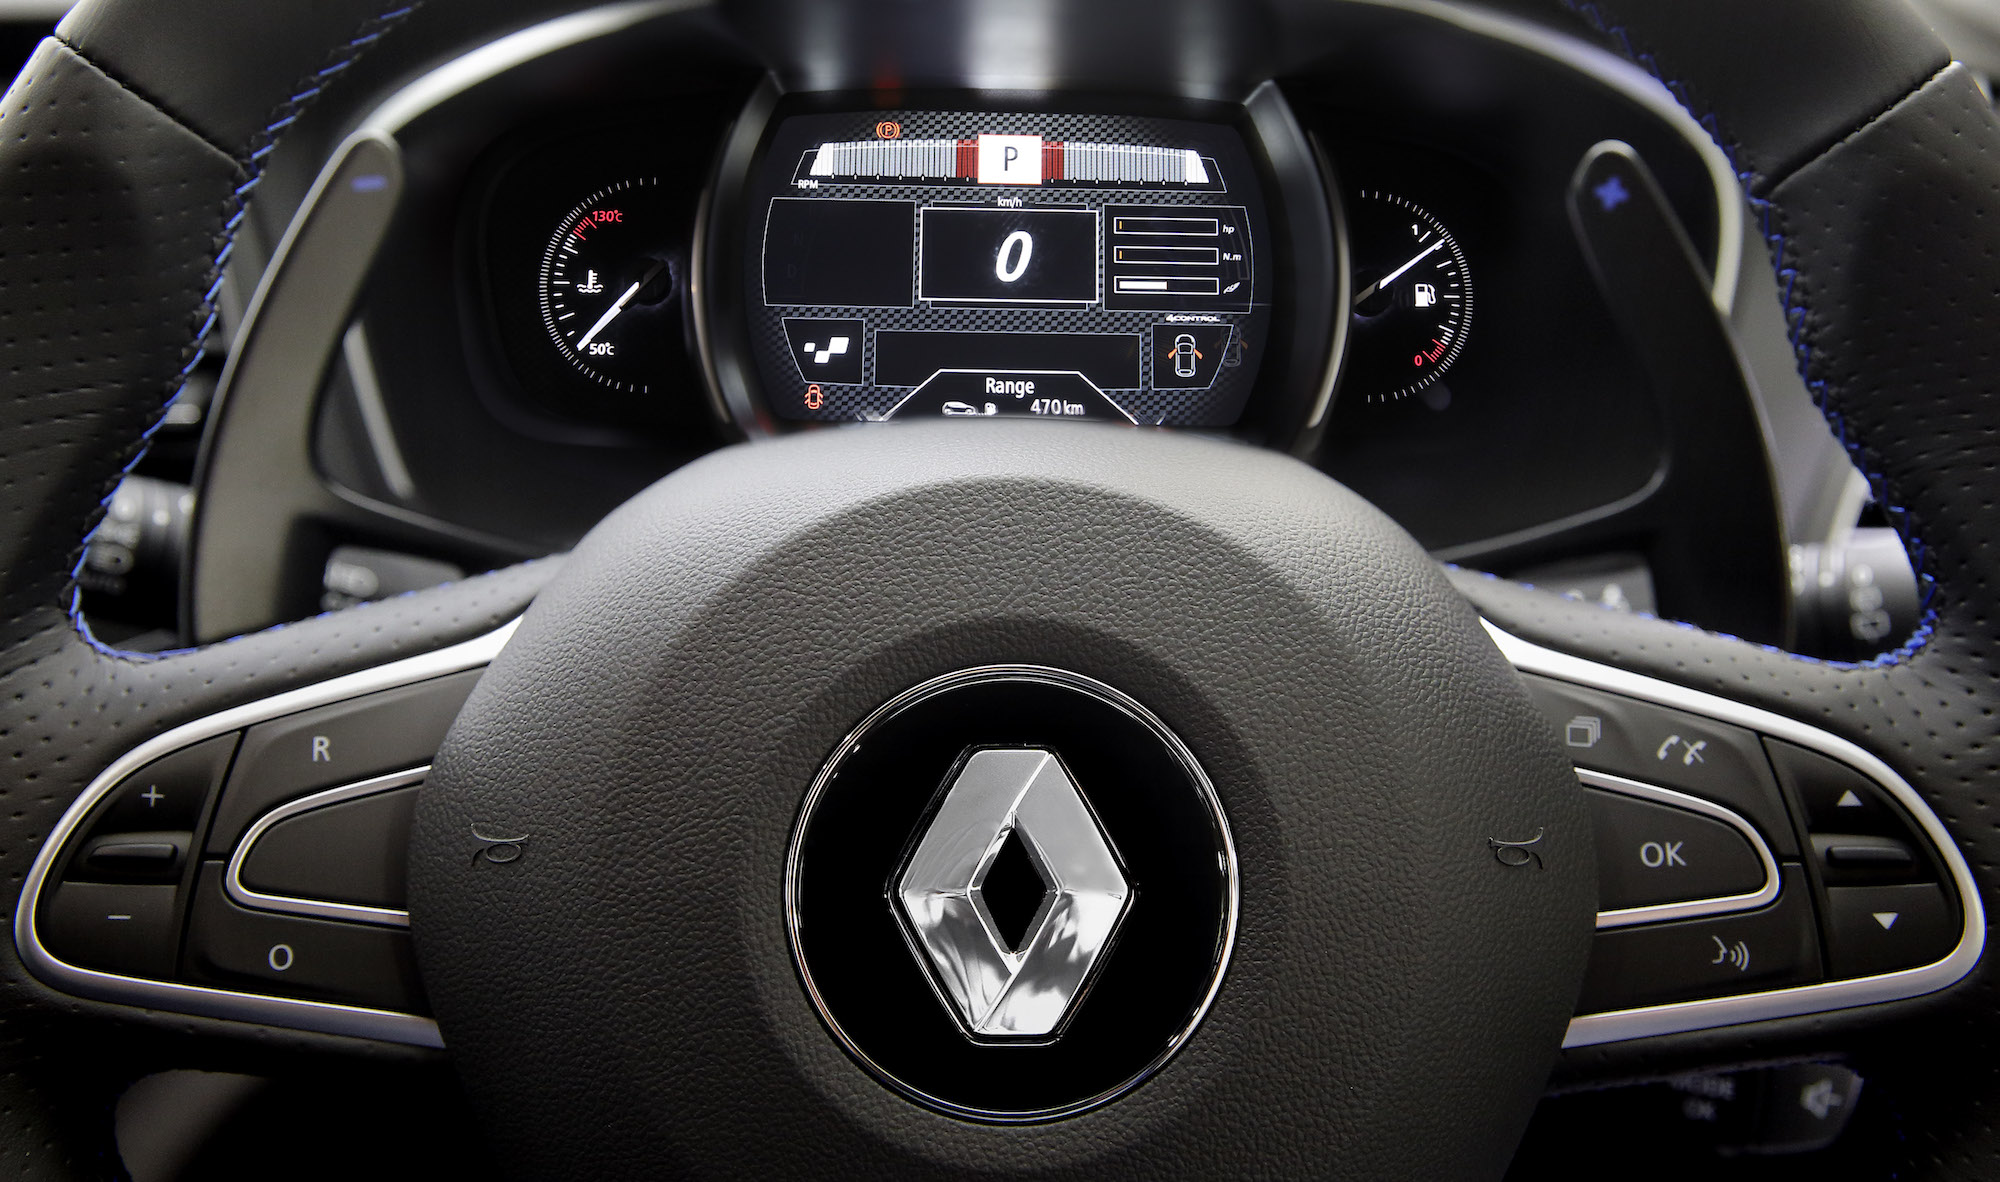 Renault Megane GT photo 170353